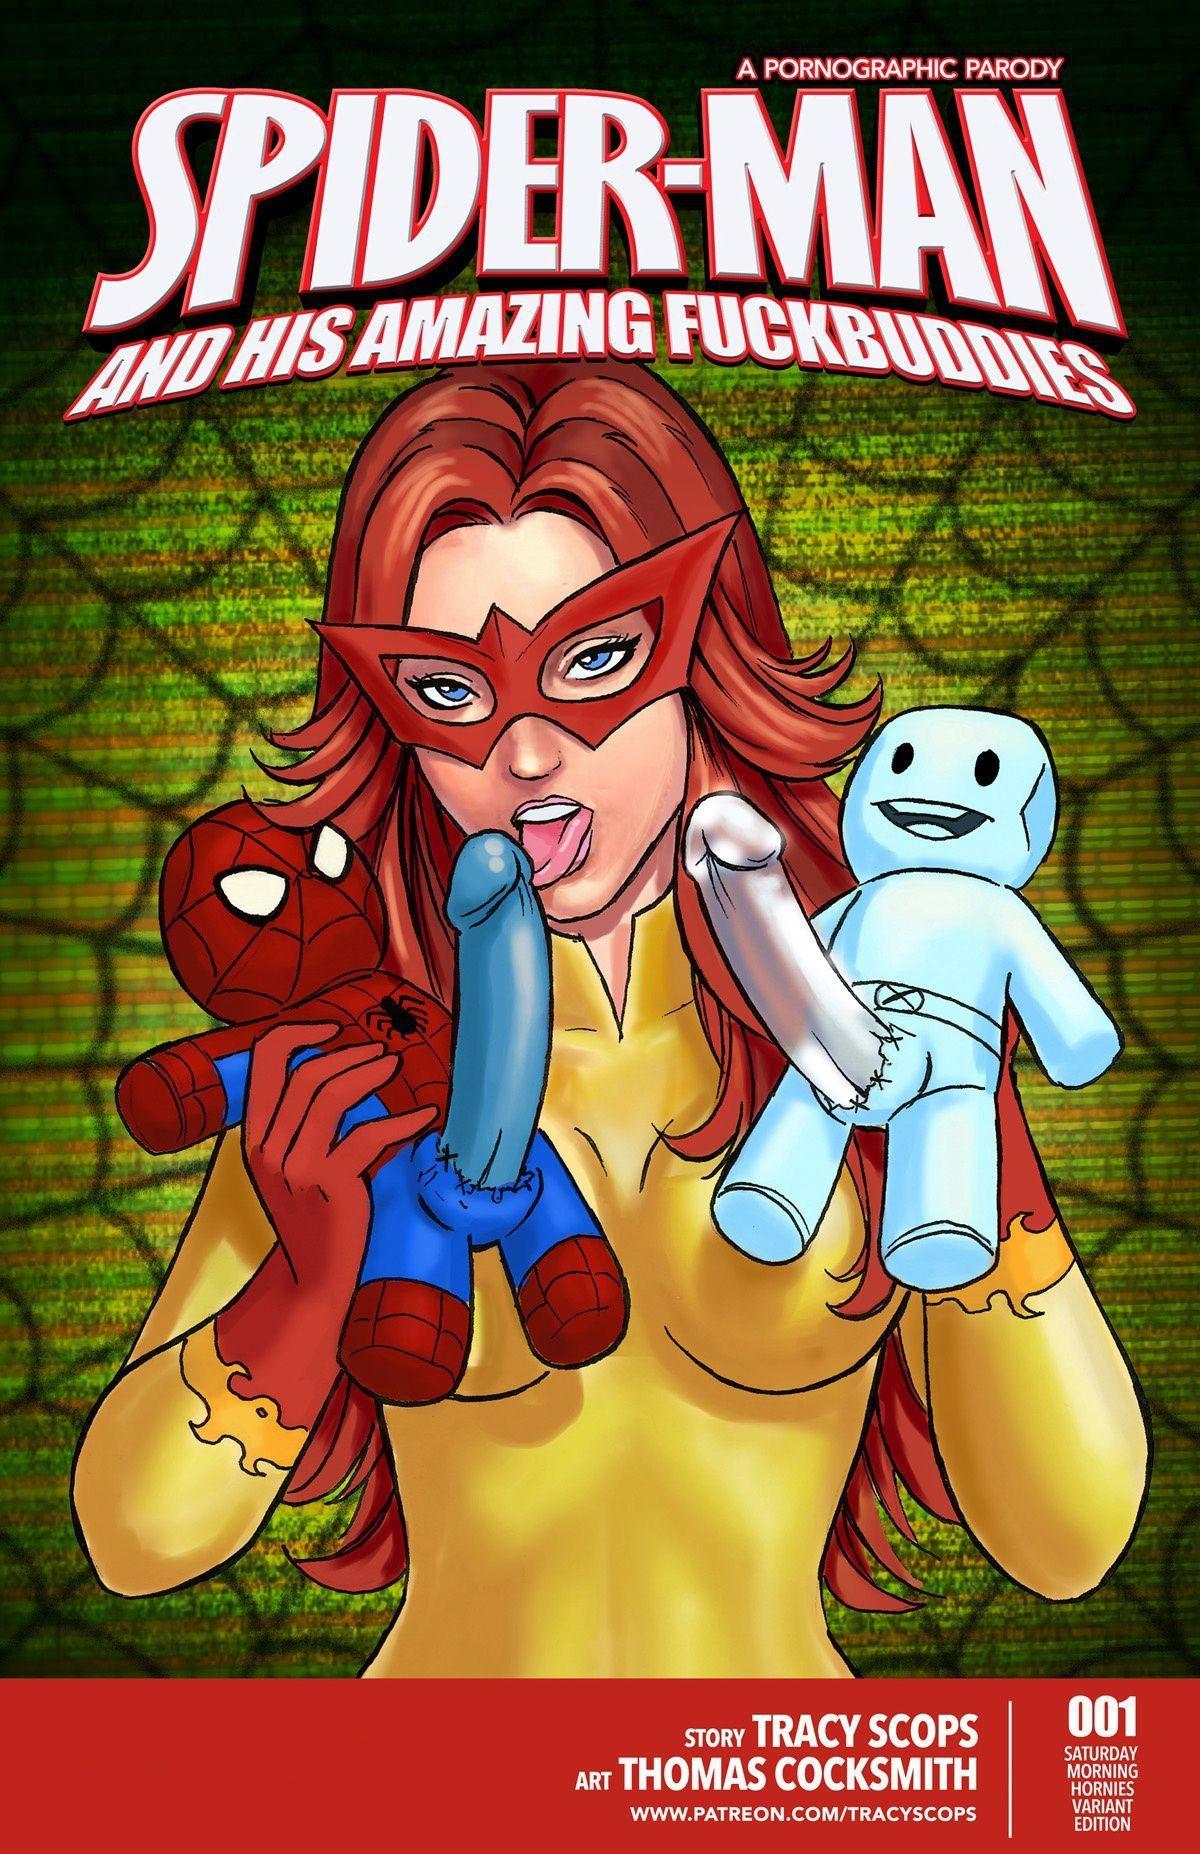 SureFap xxx porno Spider-Man - [Tracy Scops][Thomas Cocksmith] - Spider-Man And His Amazing Fuckbuddies